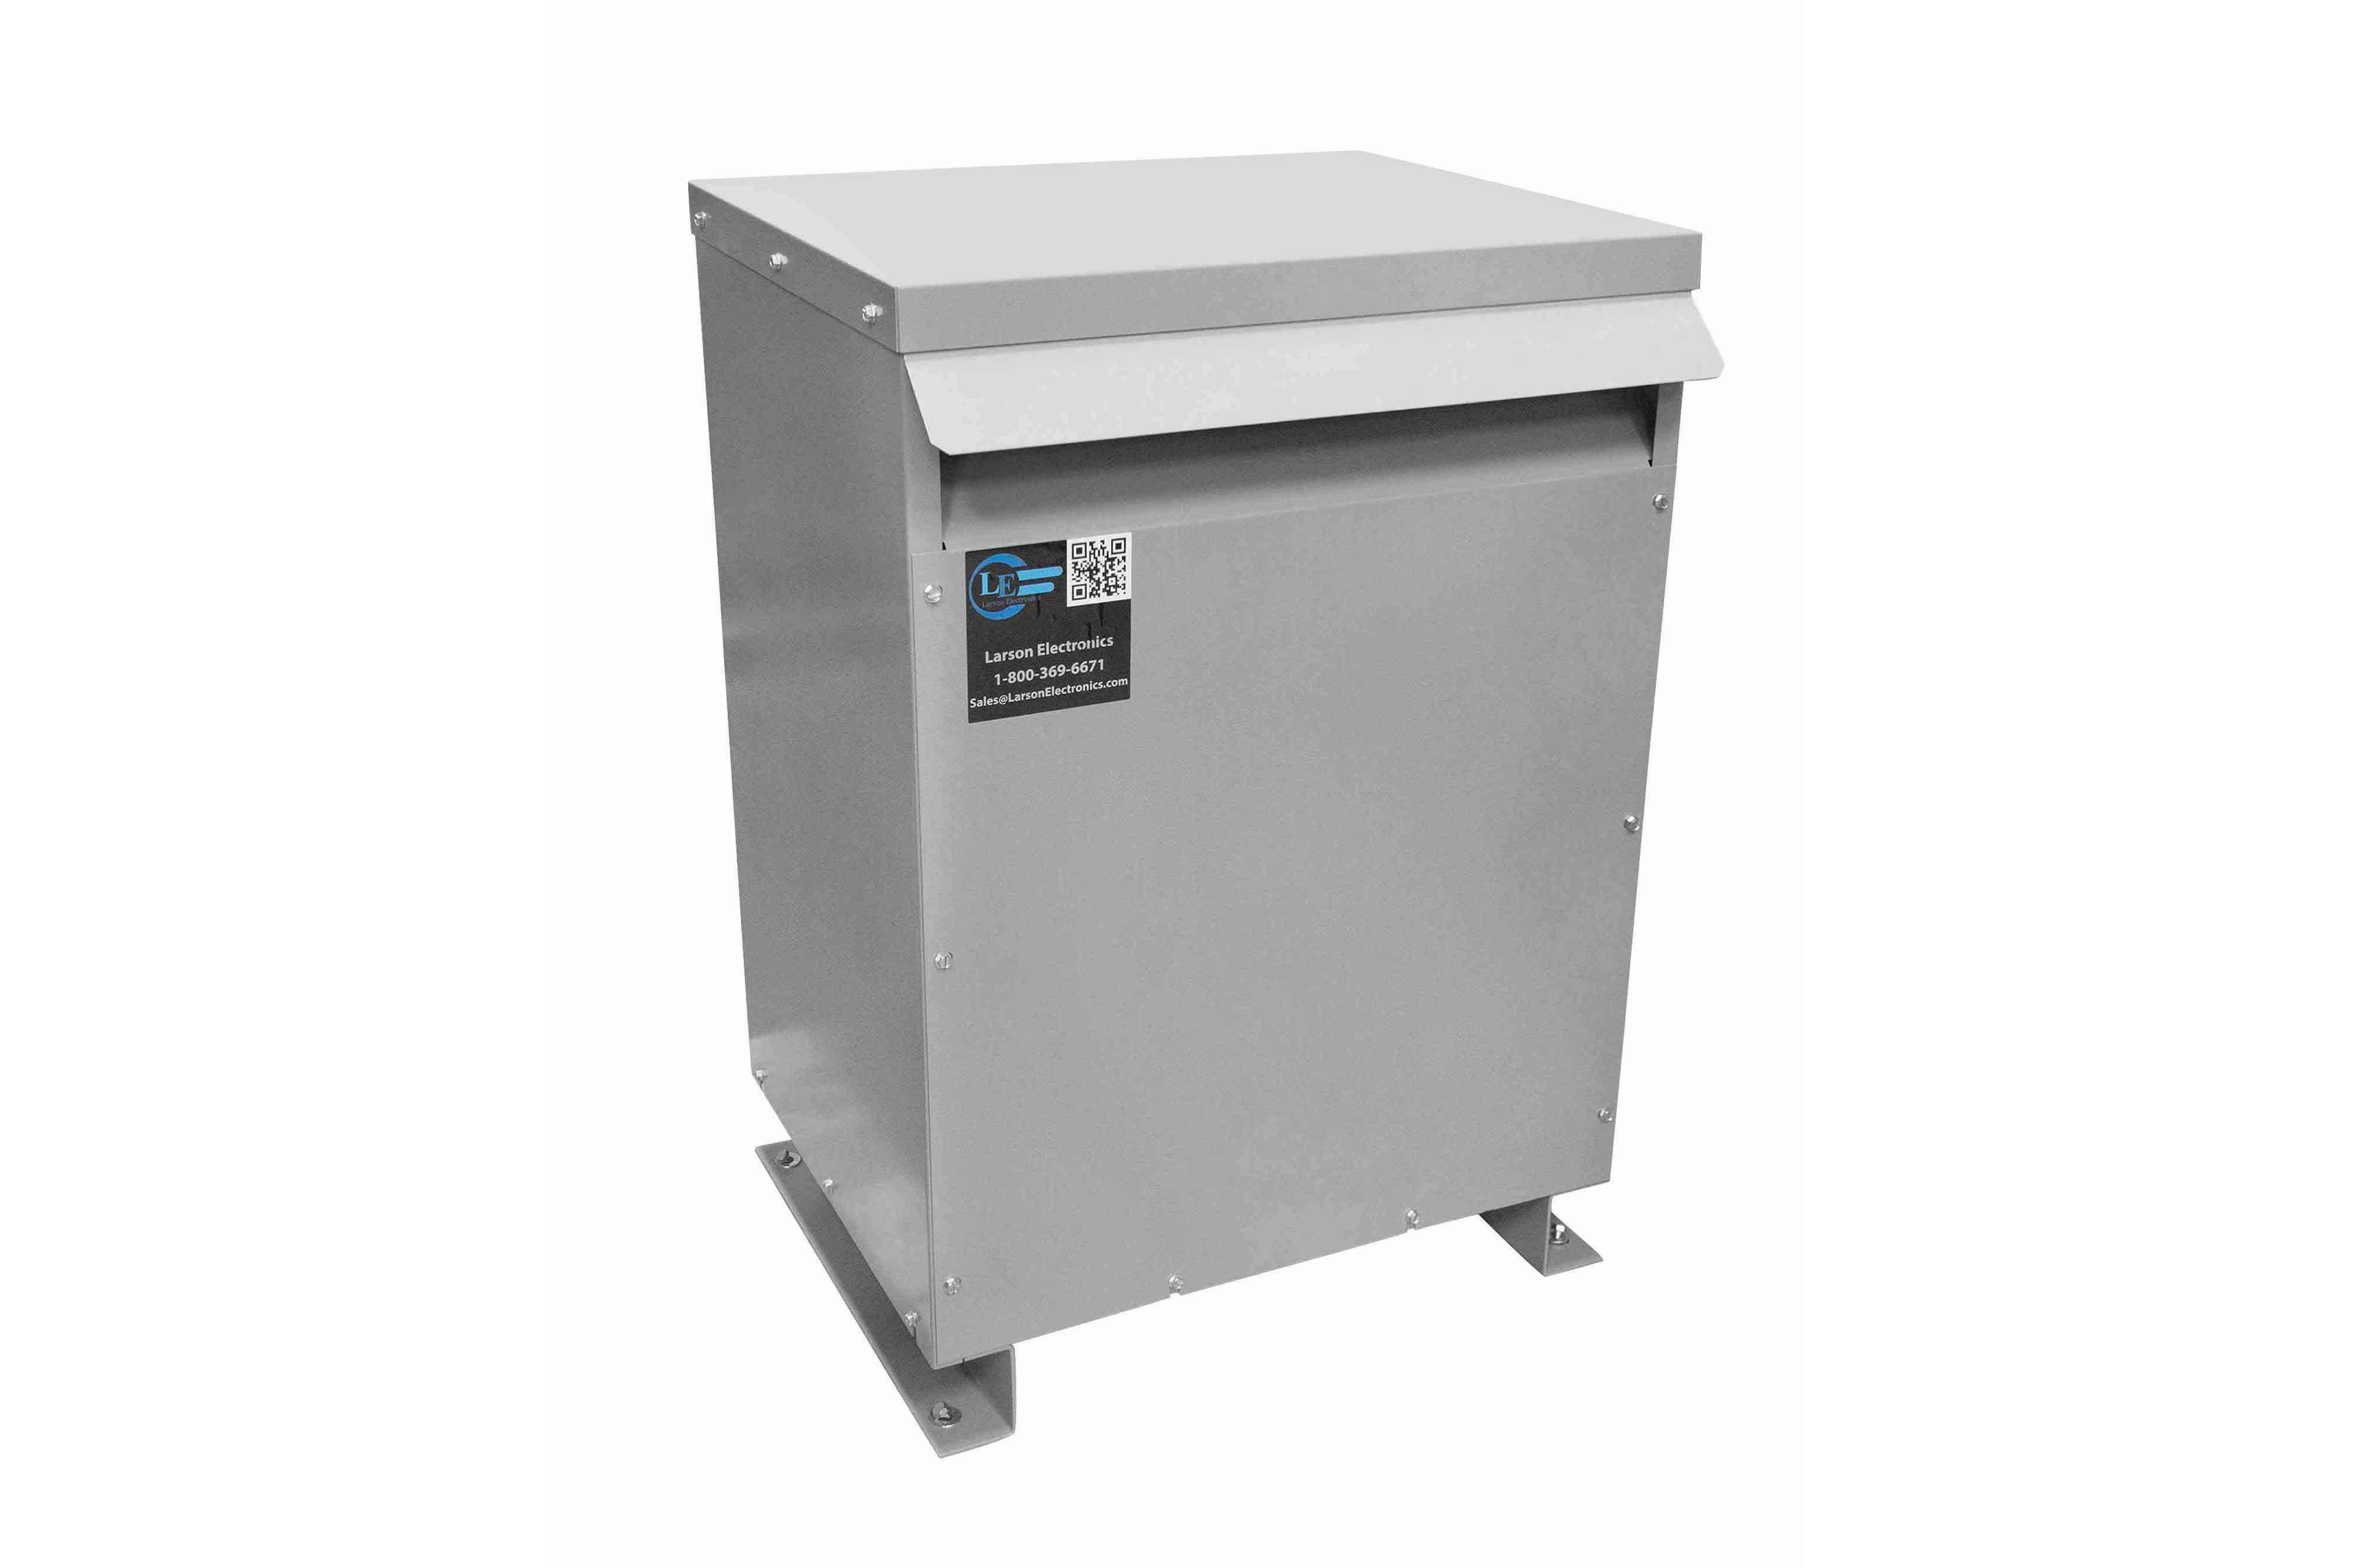 29 kVA 3PH Isolation Transformer, 240V Wye Primary, 380V Delta Secondary, N3R, Ventilated, 60 Hz